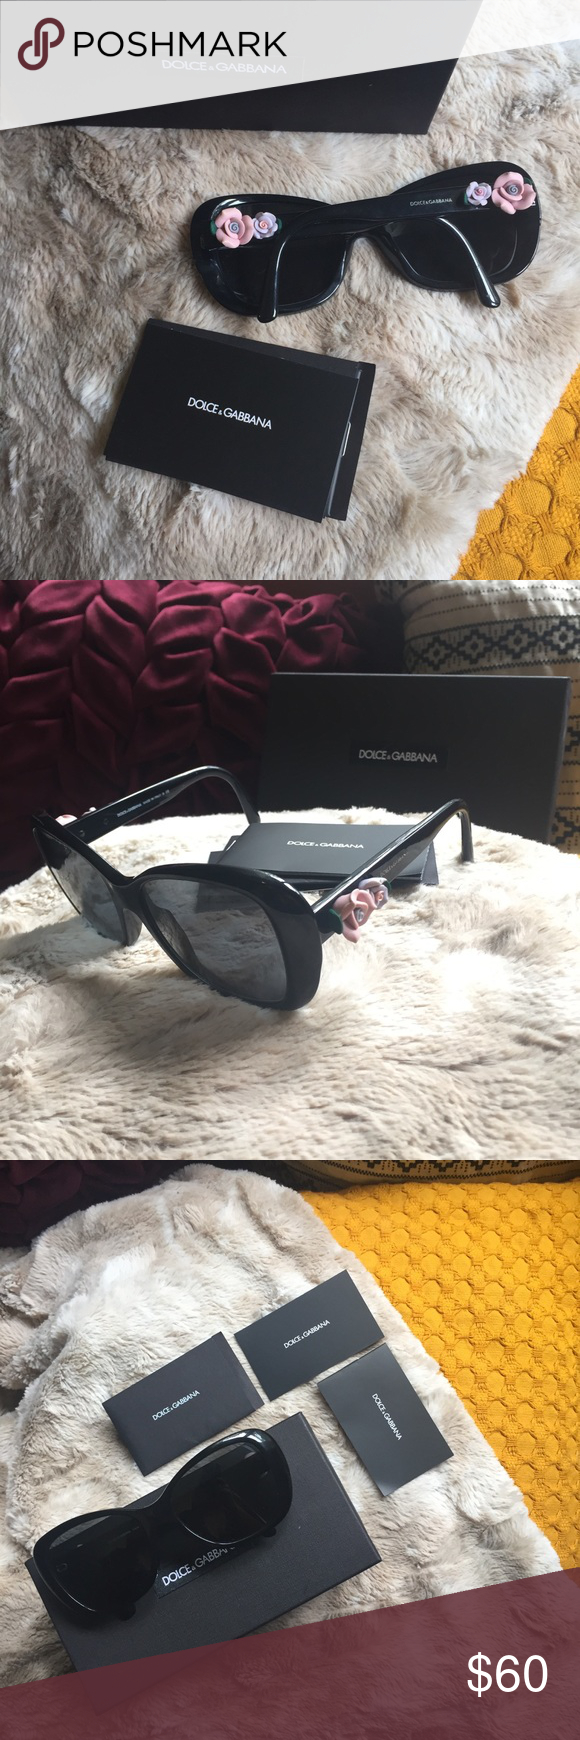 35cfddc3df D G Floral Jackie O Sunglasses 🕶